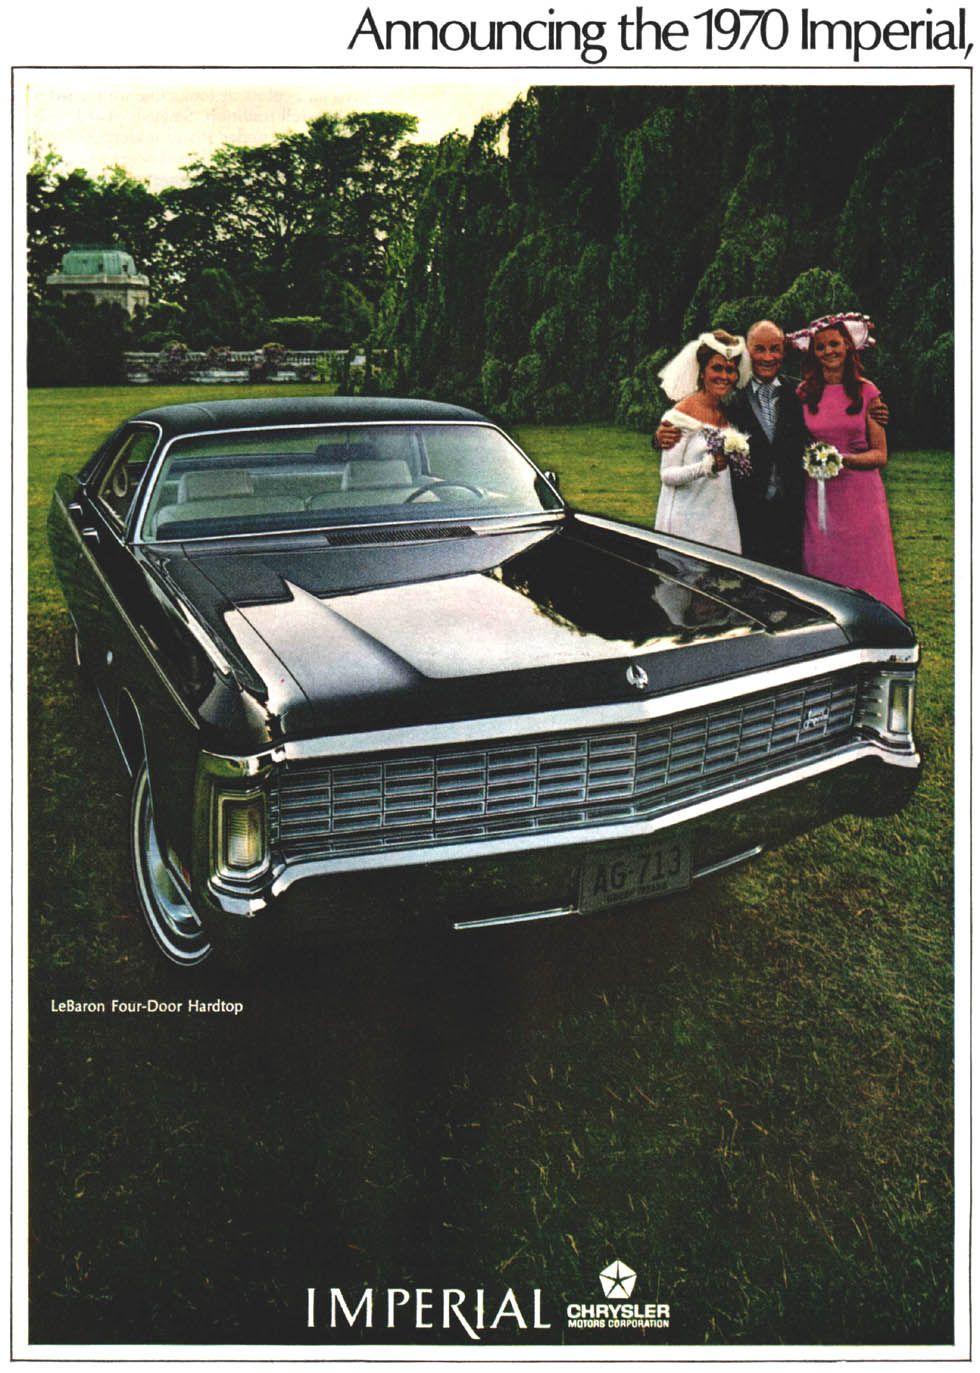 Directory Index Chrysler Imperial 1970 Chrysler Chrysler Imperial Car Ads Chrysler